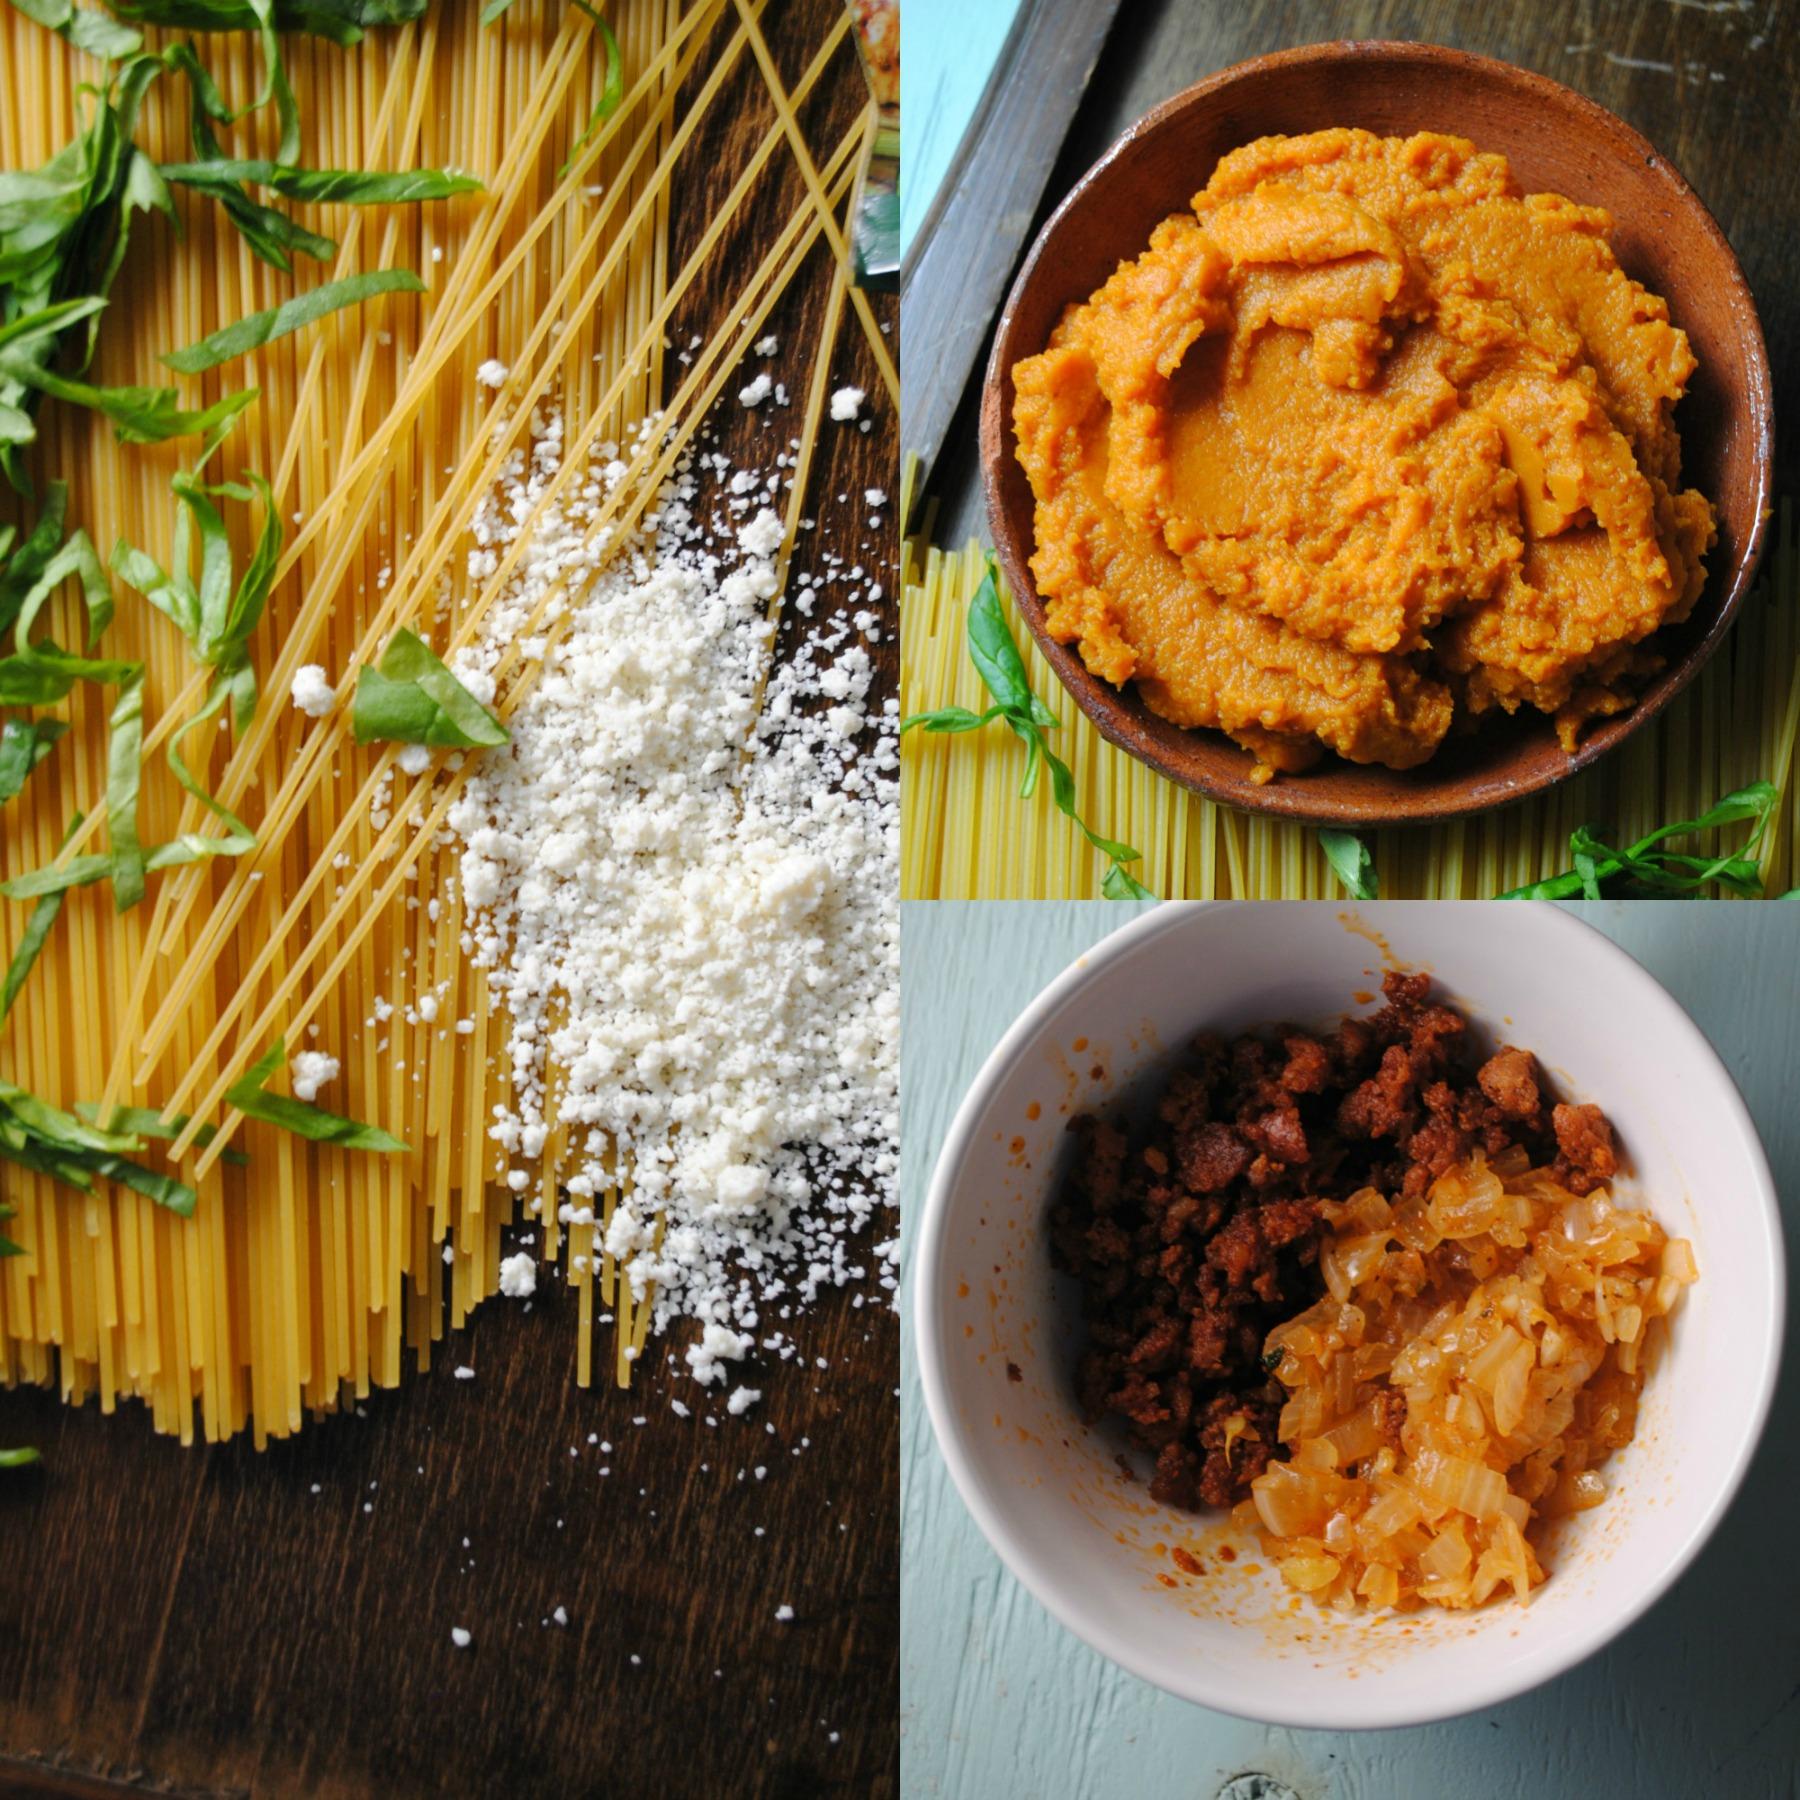 Cacique-pumpkin-pasta-with-chorizo-VianneyRodriguez